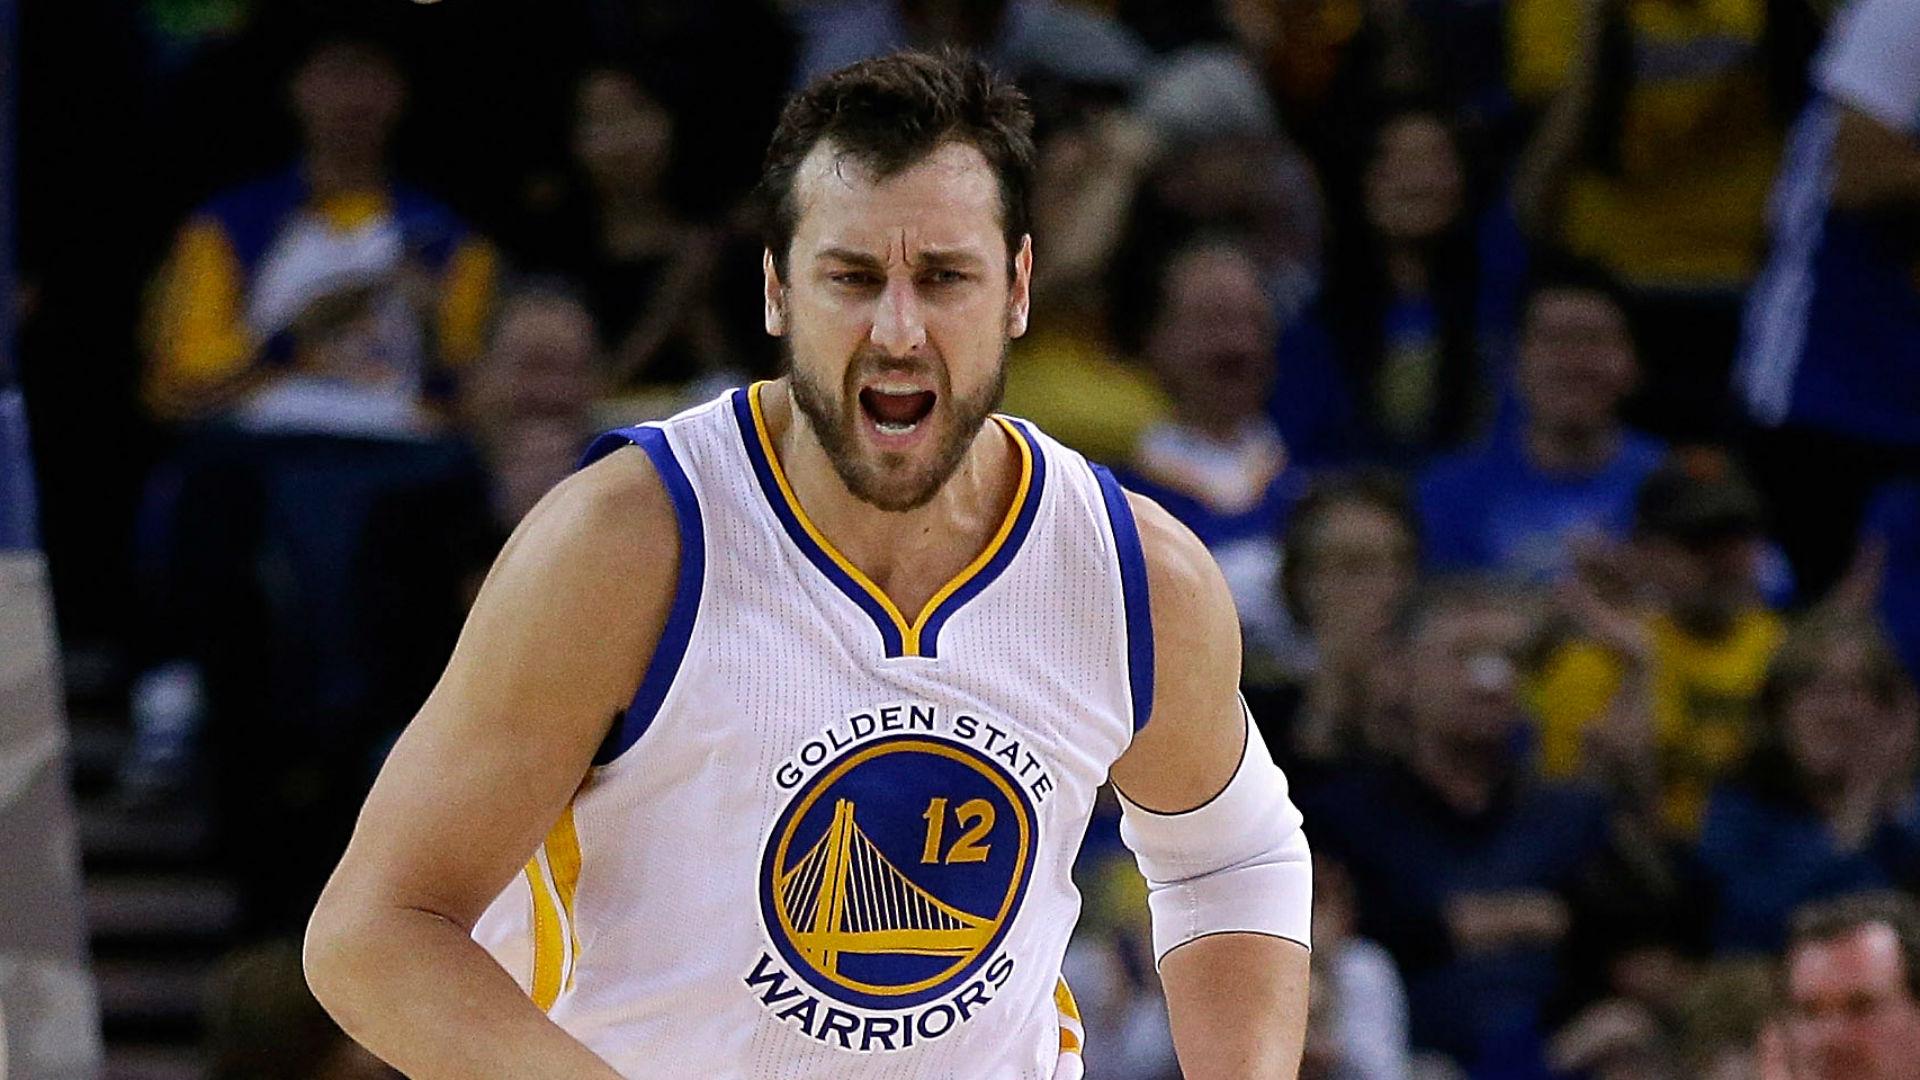 NBA free agency rumors: Warriors, 76ers among teams eyeing Andrew Bogut